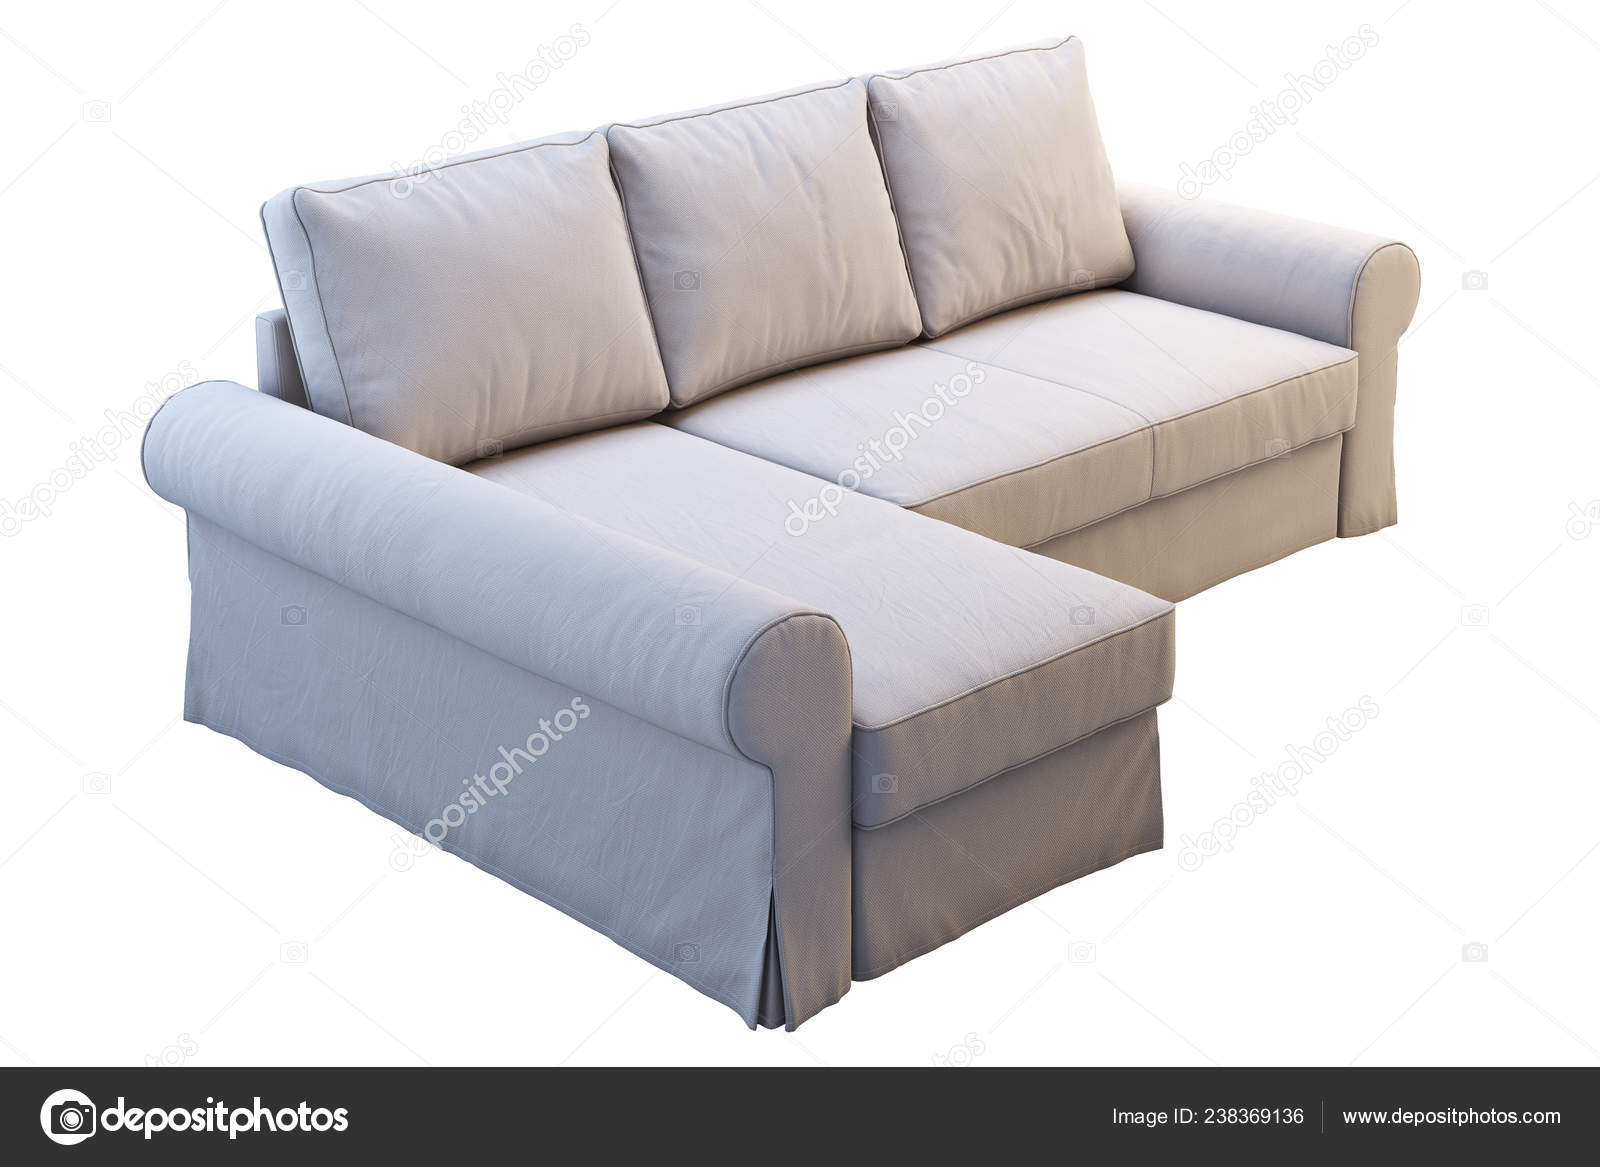 Modern Beige Fabric Sofa Chaise Lounge White Background Scandinavian Interior Stock Photo C 3dmitruk 238369136